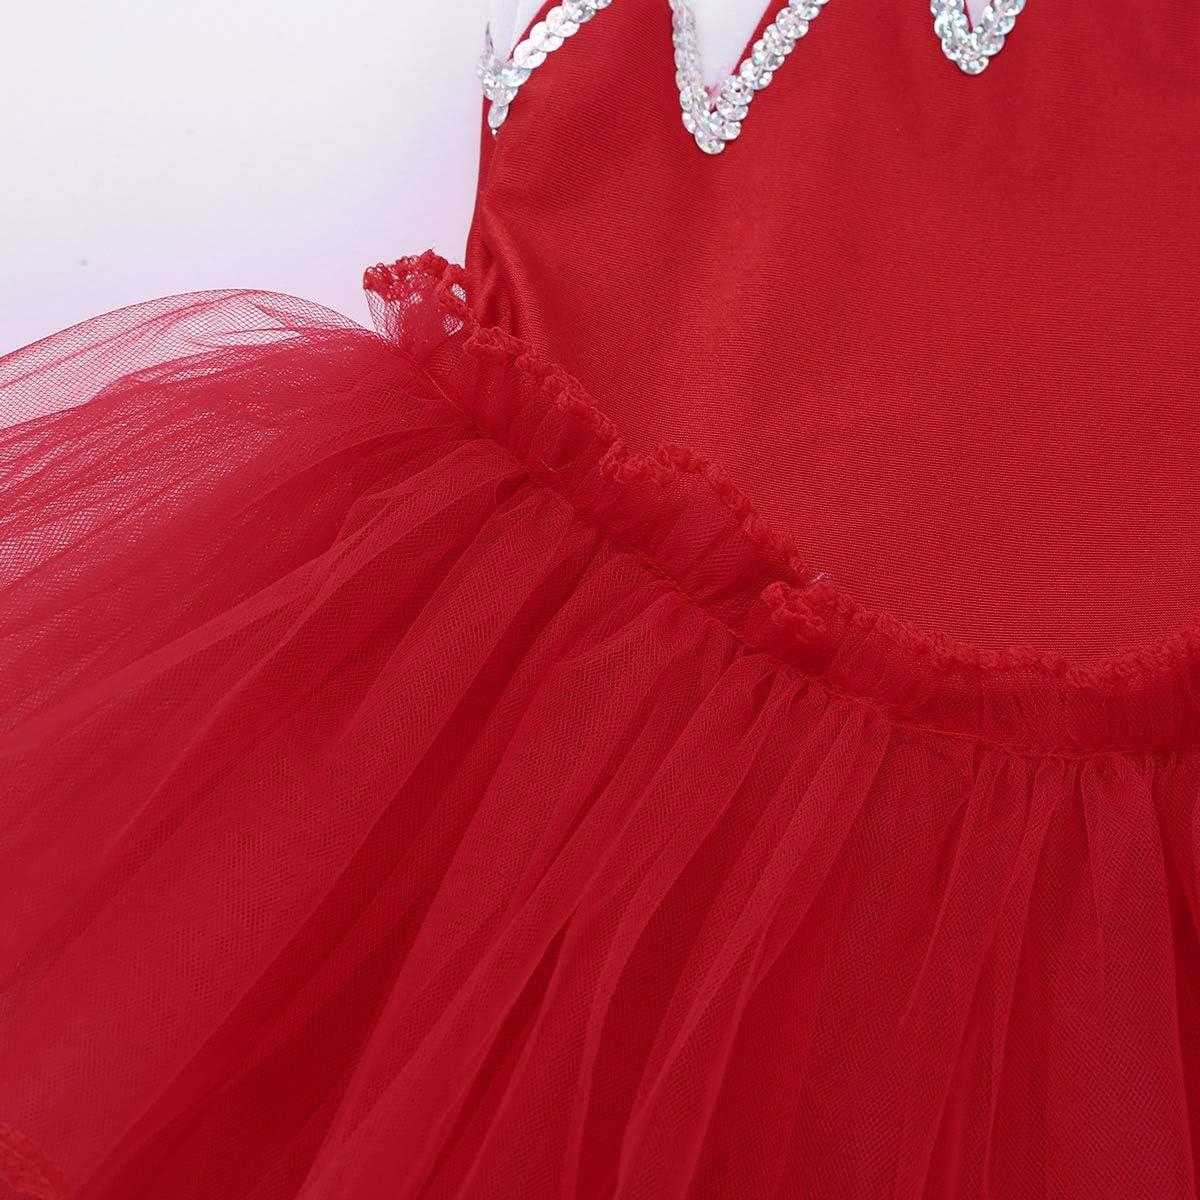 Agoky Kids Girls Halter Sleveeless Sequins Mesh Ballet Tutu Dress Gymnastics Leotard Jumpsuit